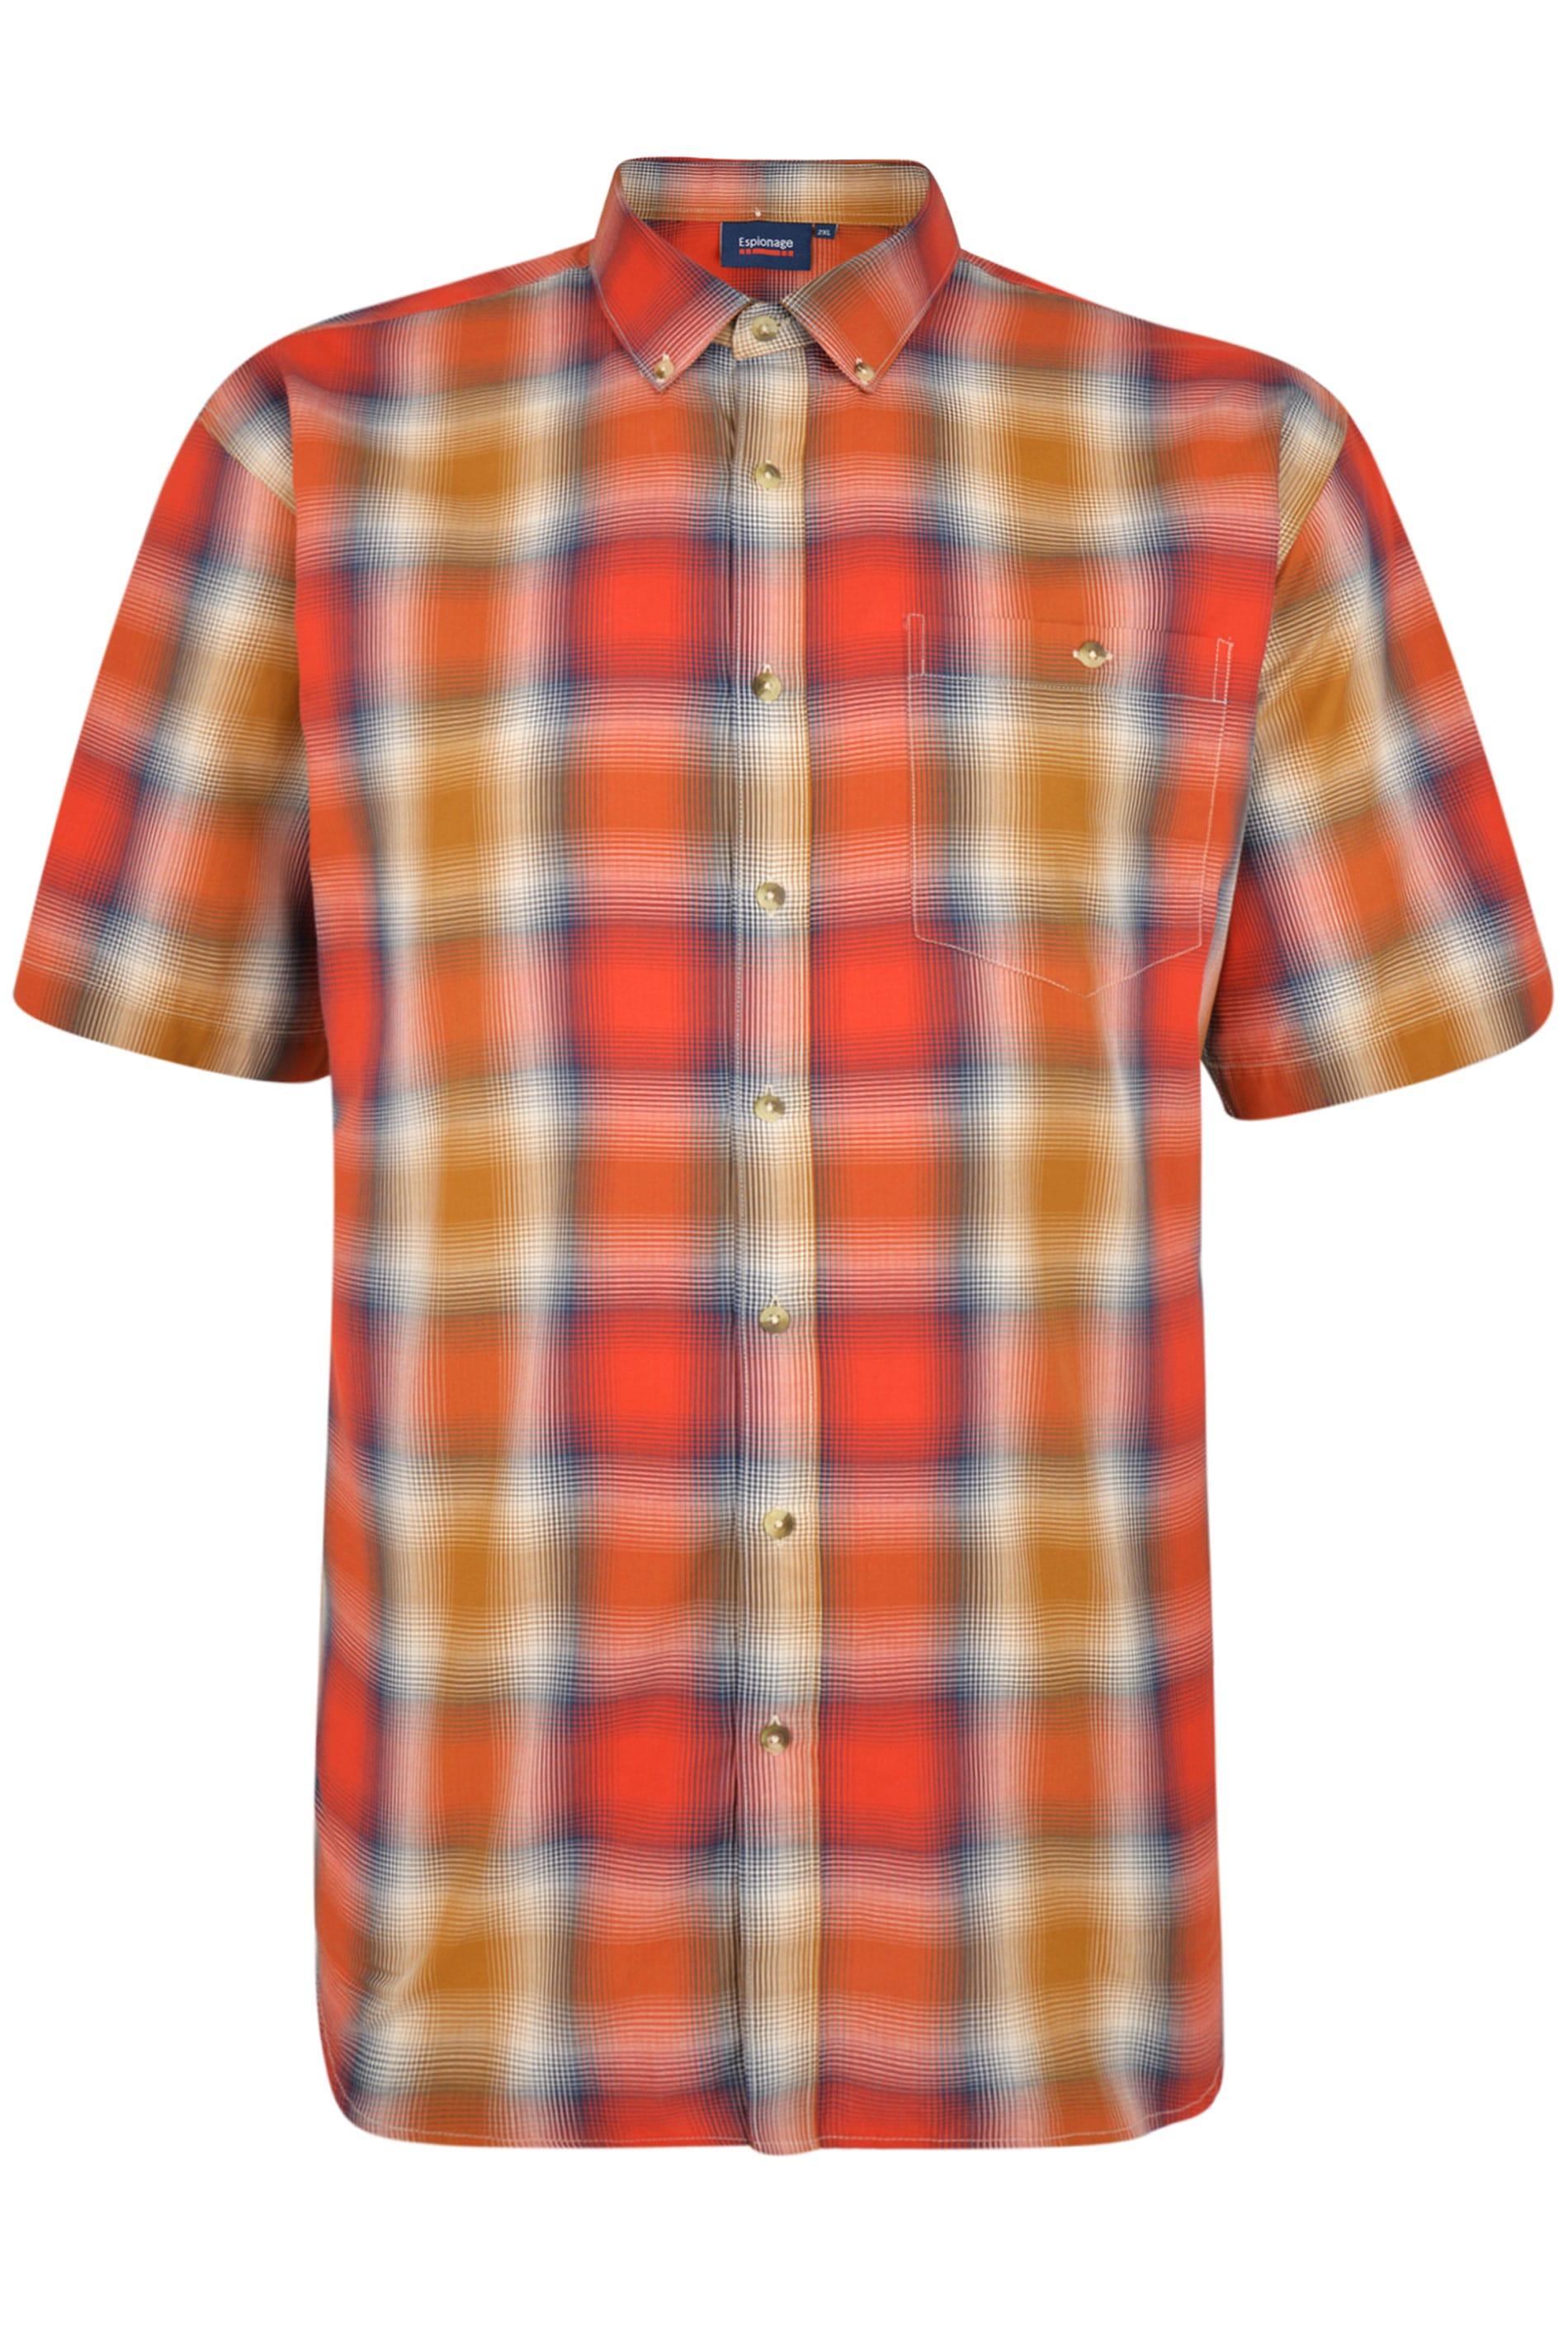 ESPIONAGE Orange Check Shirt